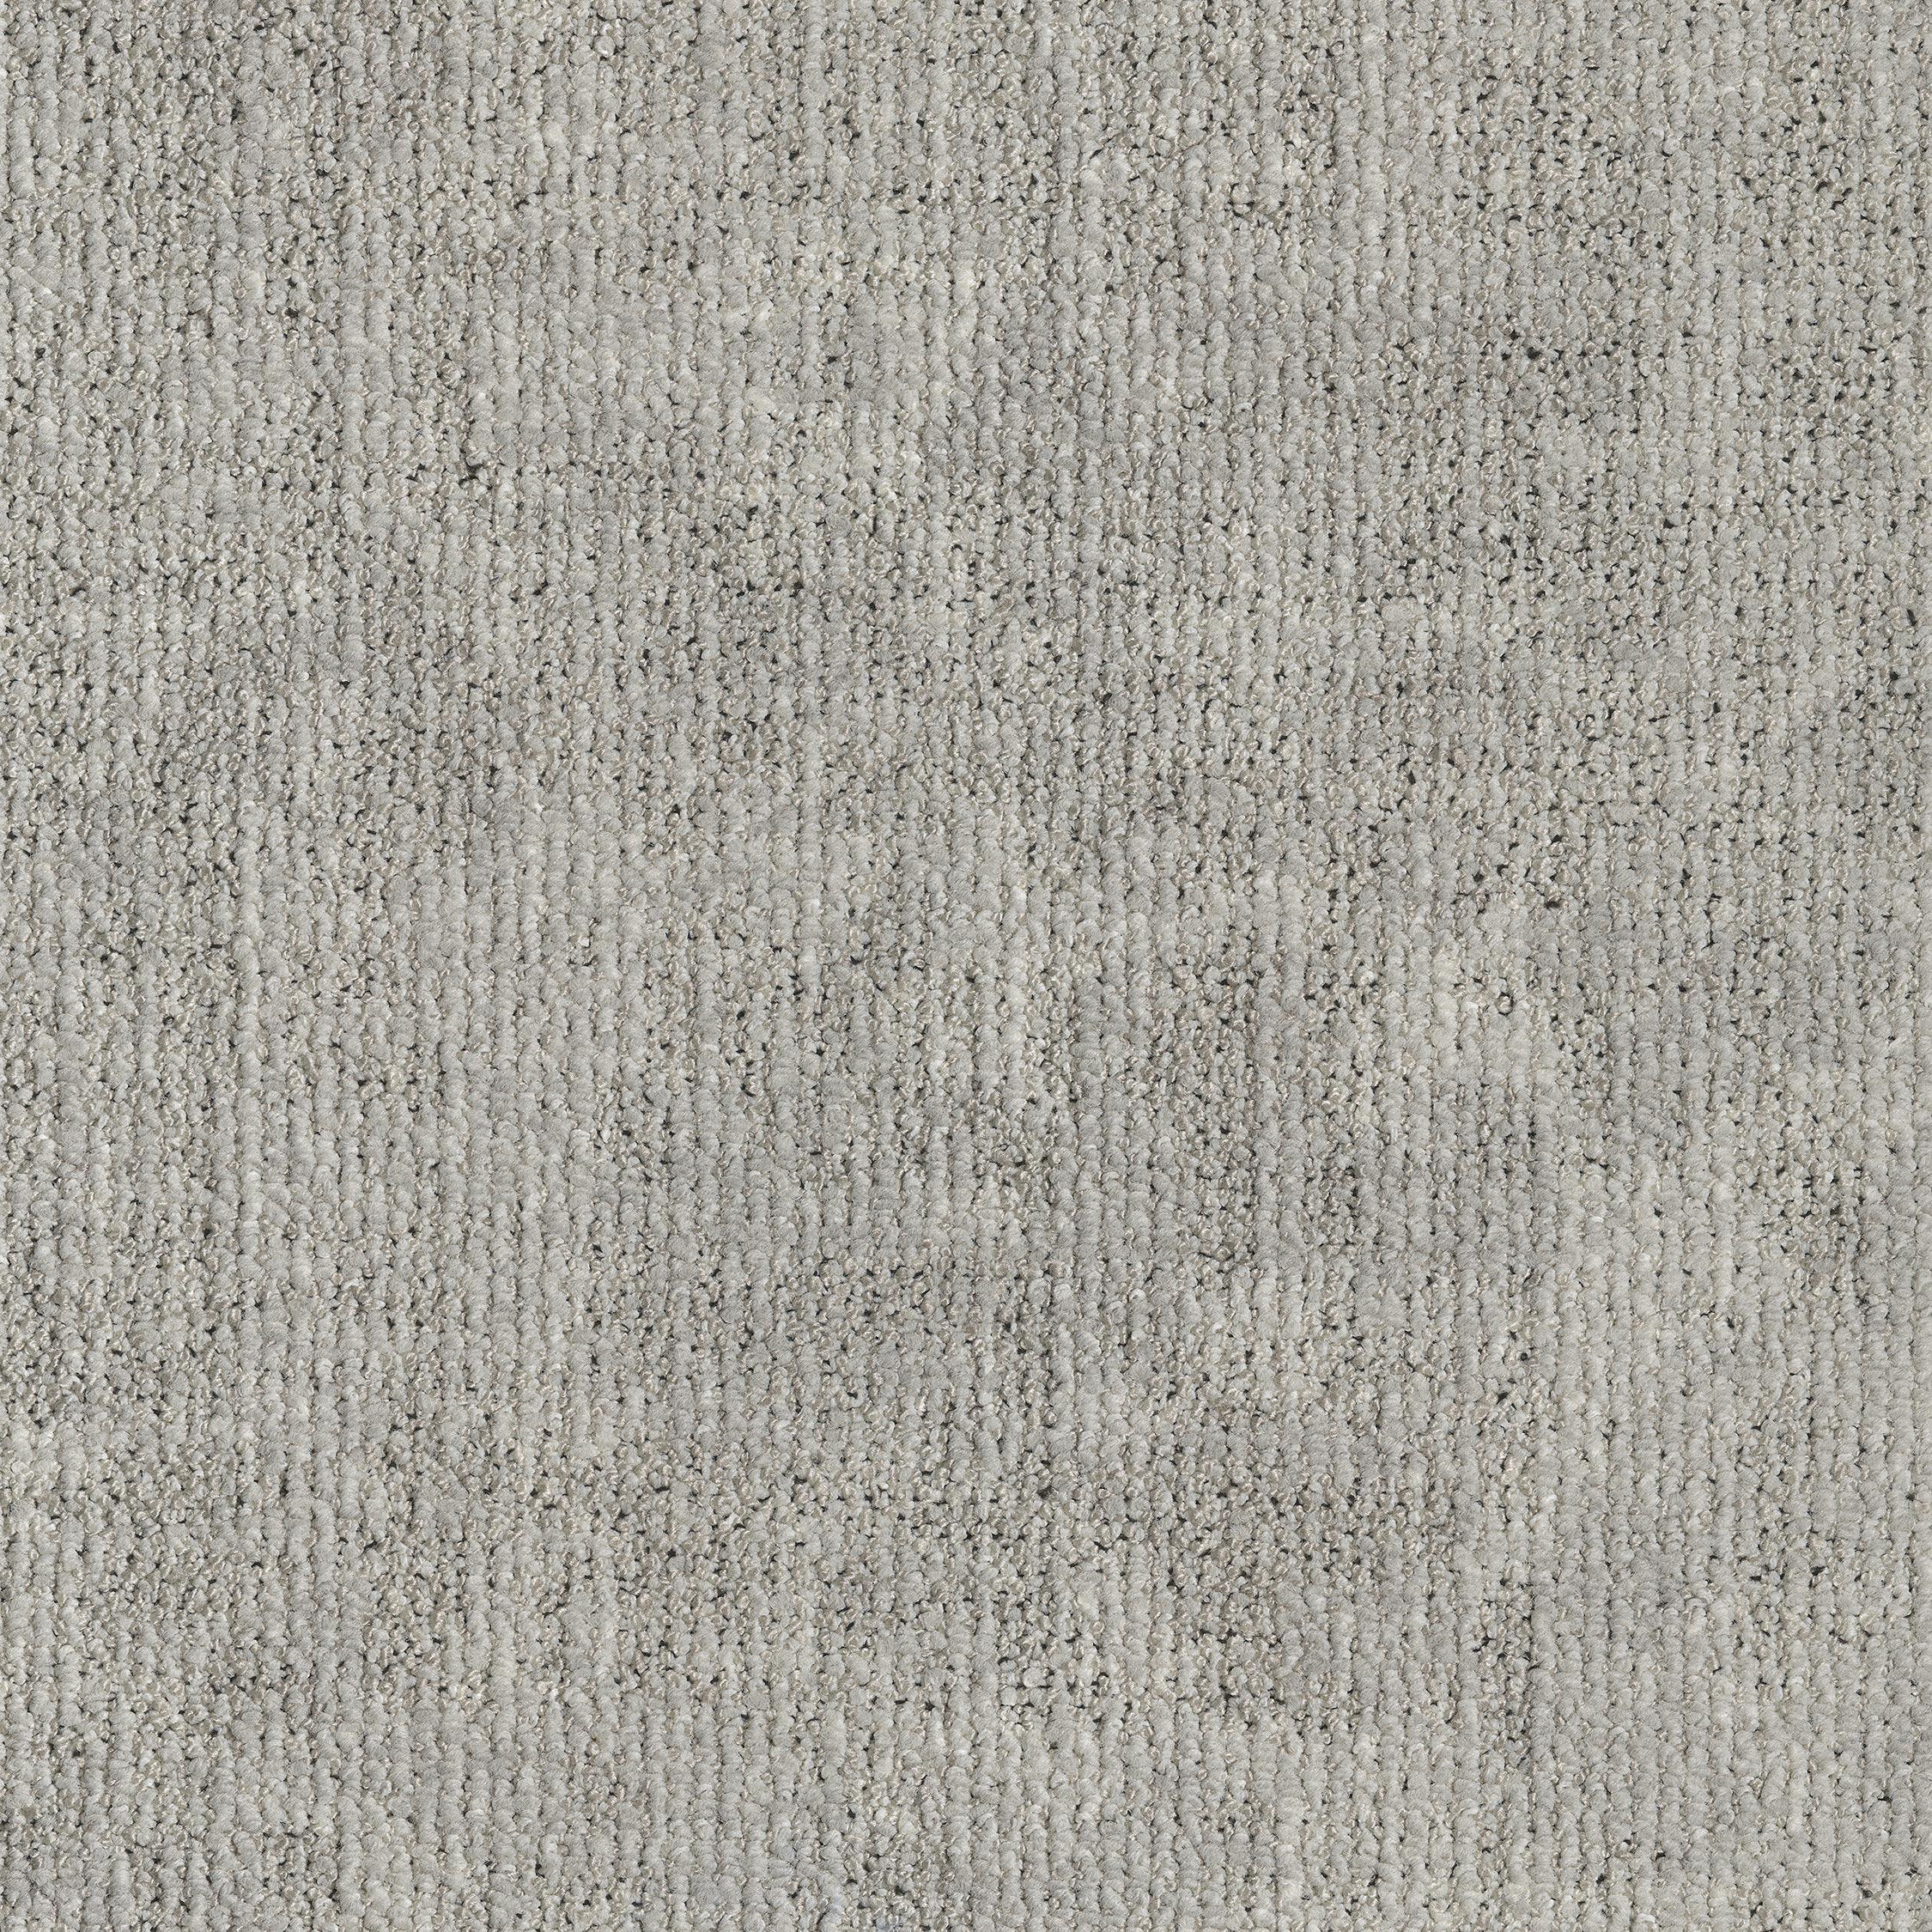 Granite Abstract Leaves Light Gray Rug | Light grey rug